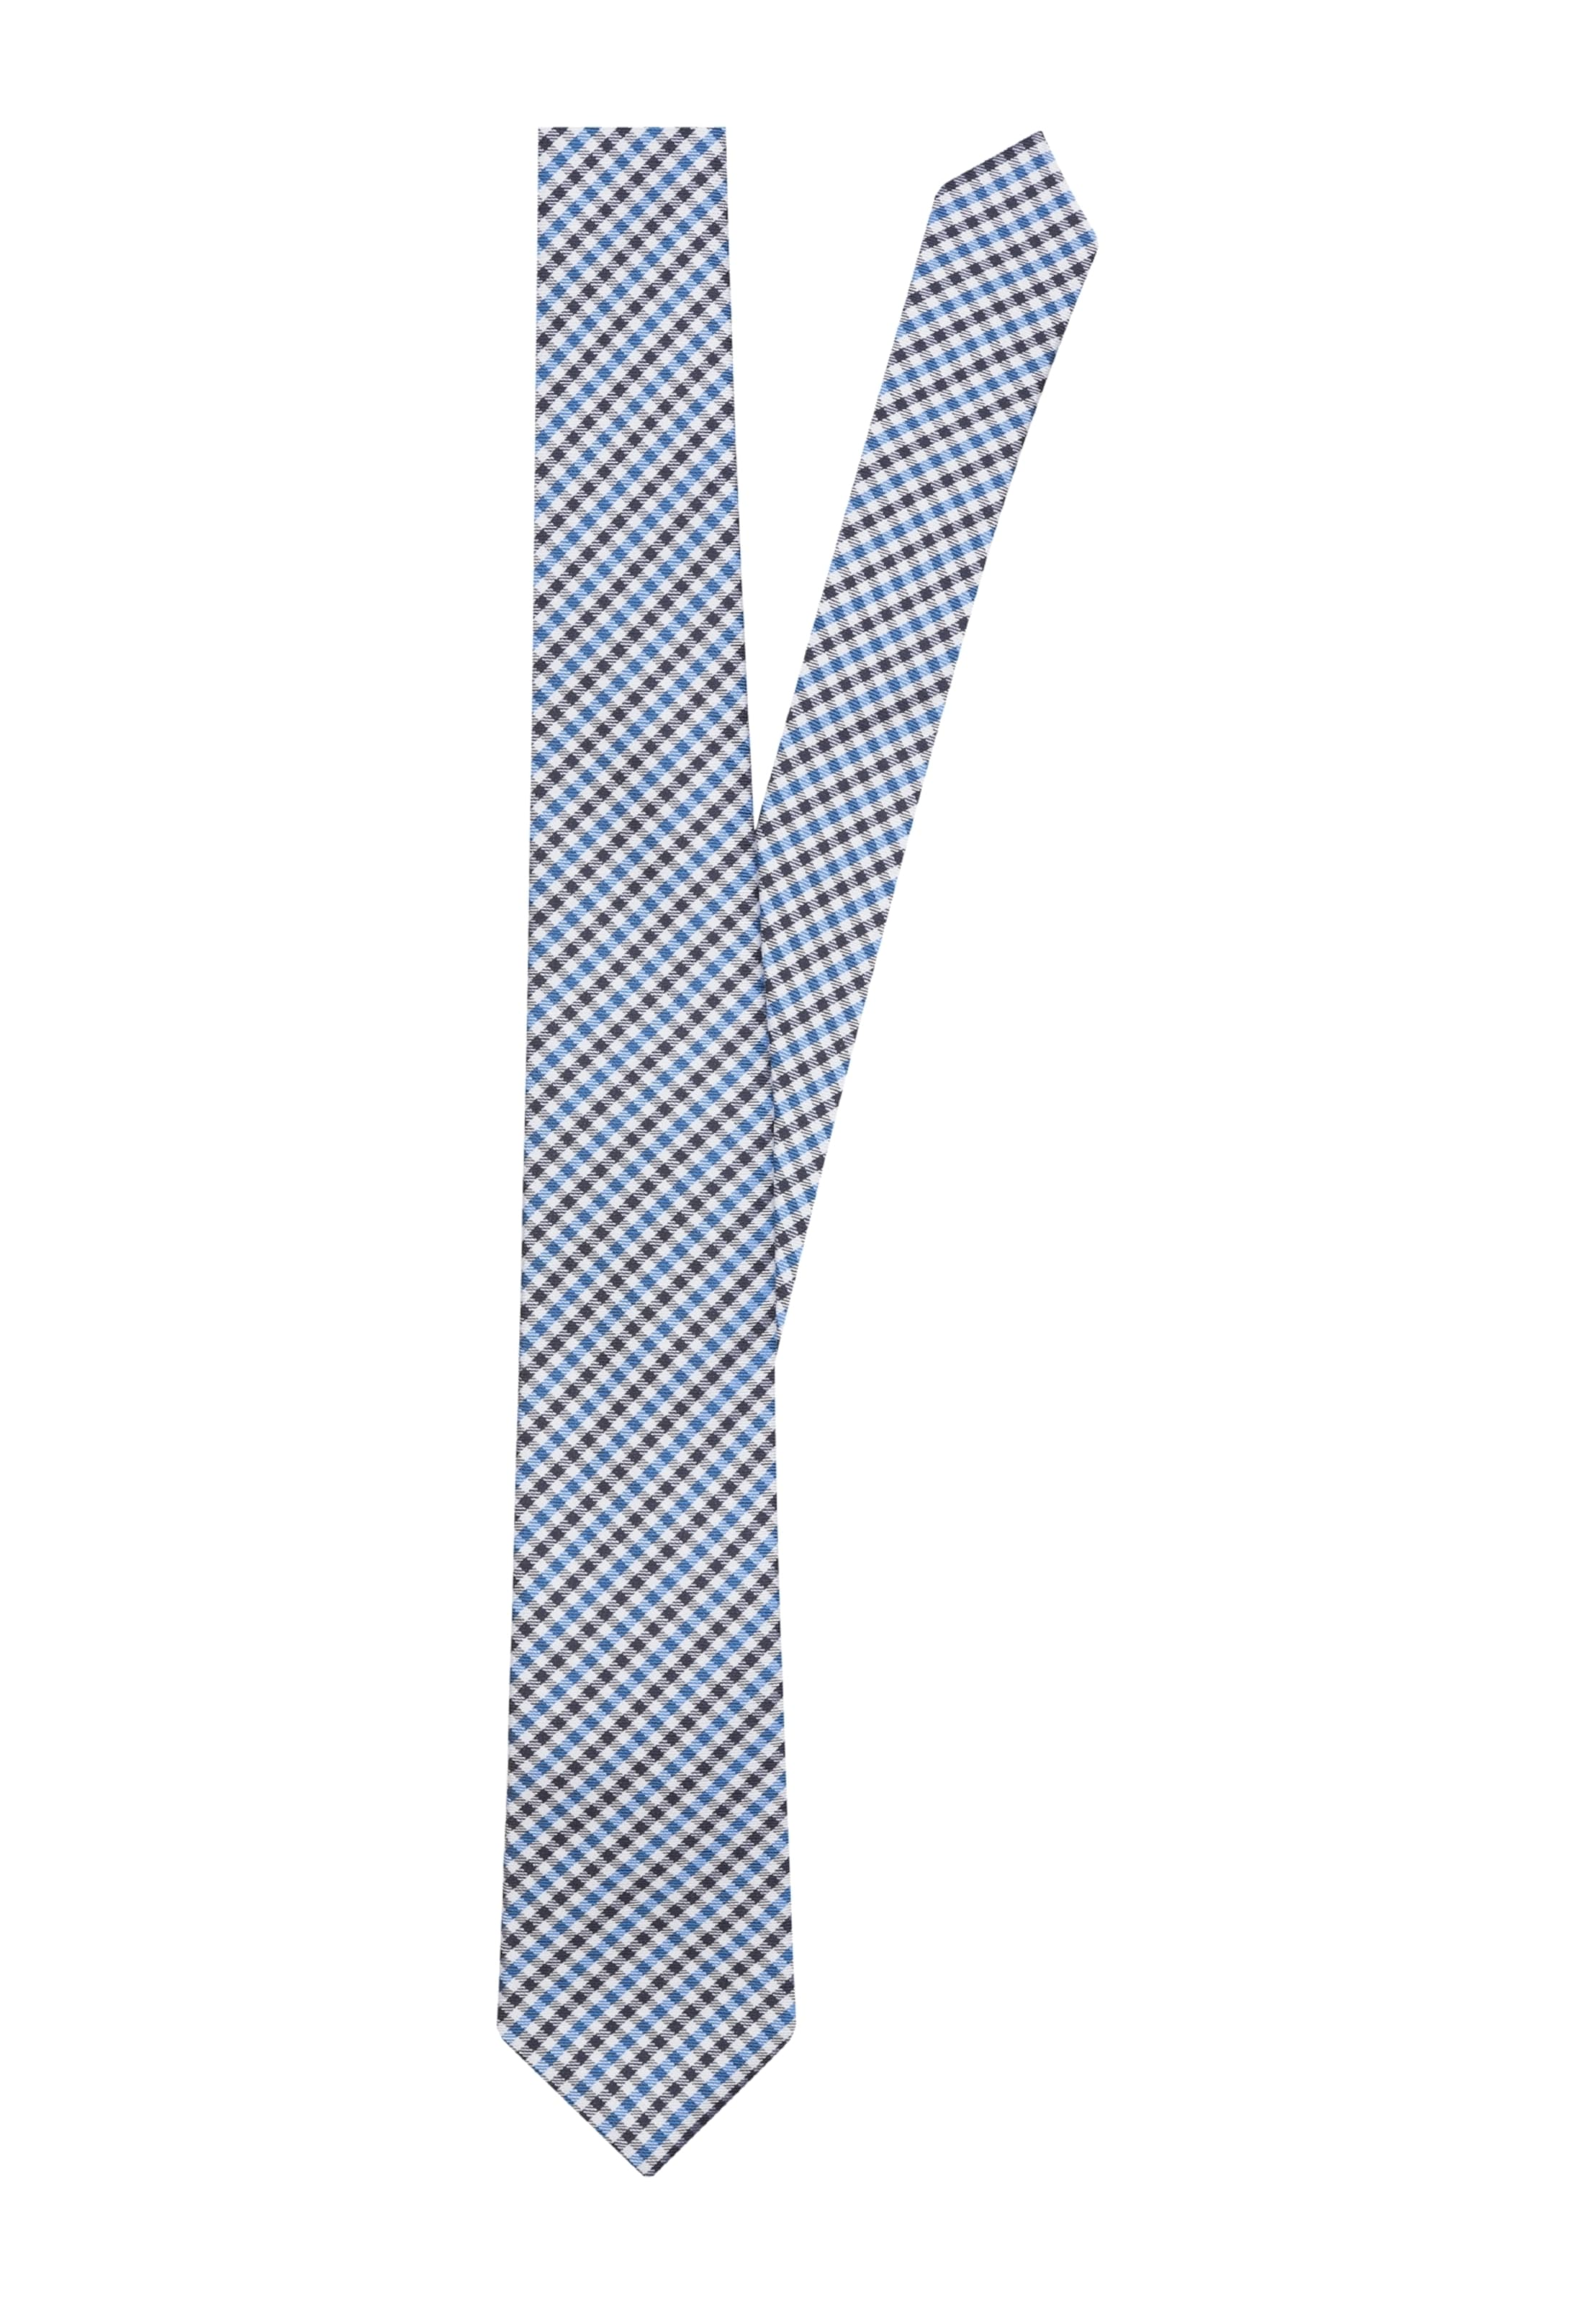 'schwarze En Blanc Seidensticker Rose' Cravate BleuAnthracite 8kXP0wOn